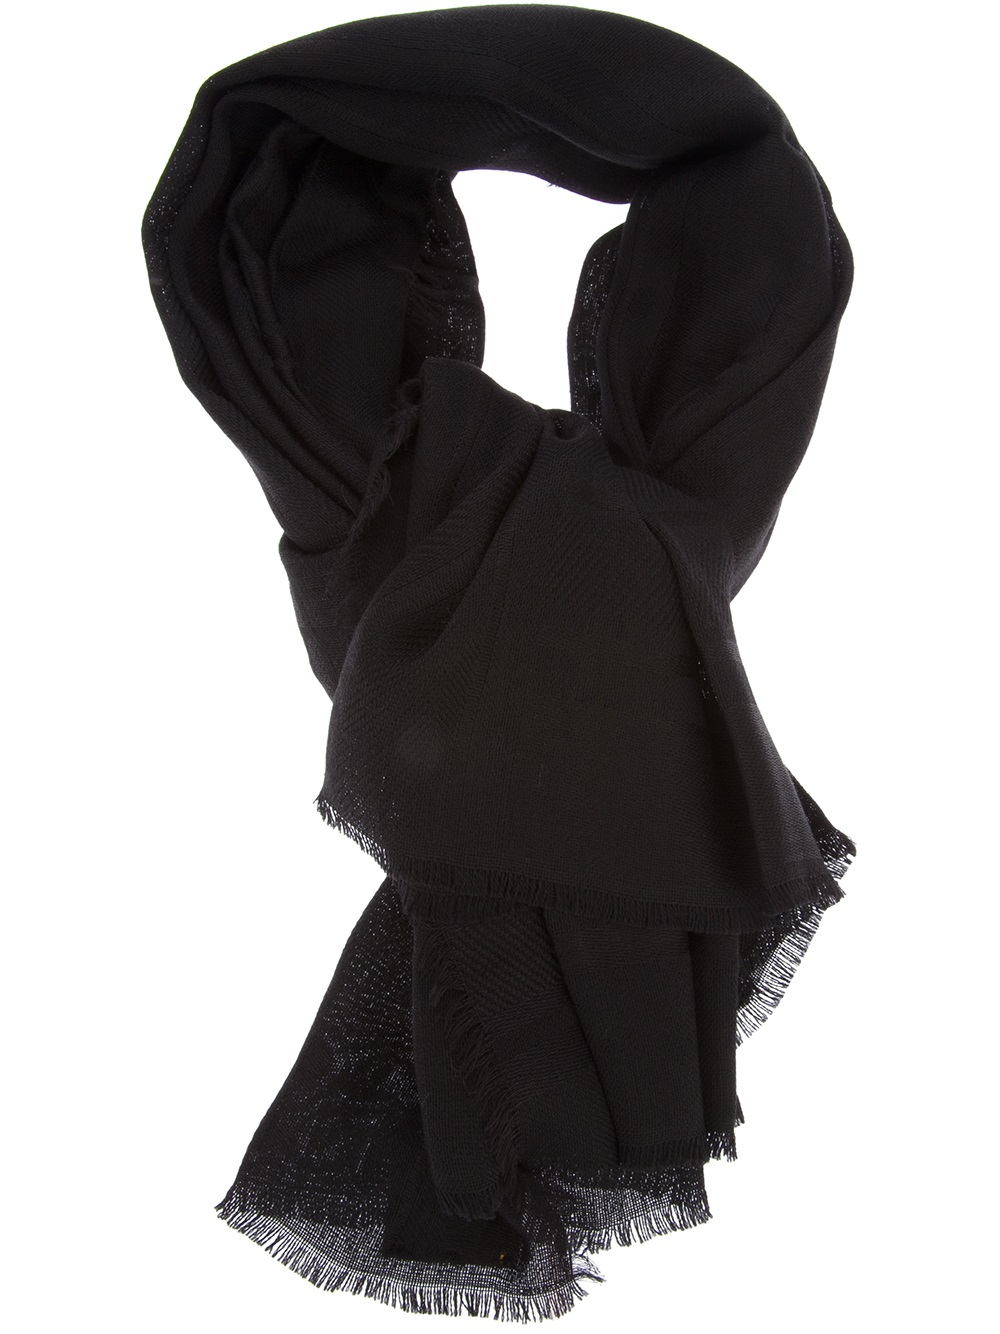 ca24e68bca6 france lyst fendi karlito scarf in black c0f47 f30b7